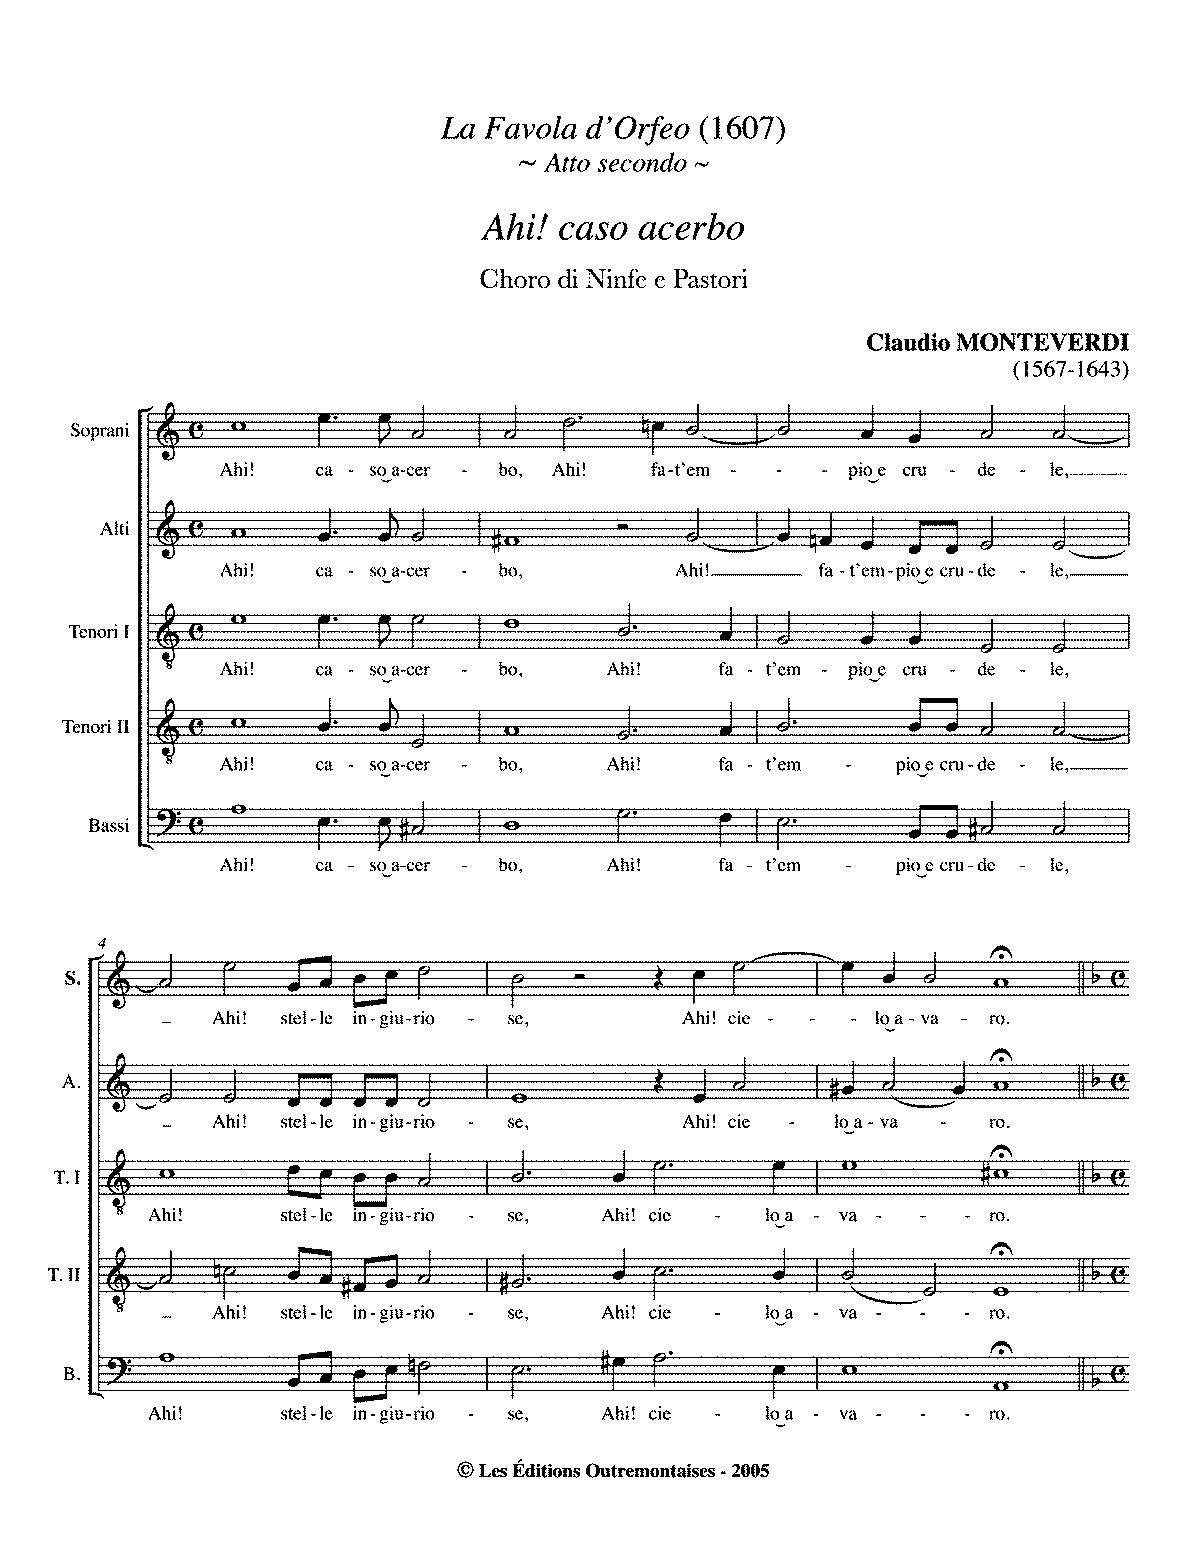 L\'Orfeo, SV 318 (Monteverdi, Claudio) - IMSLP/Petrucci Music Library ...